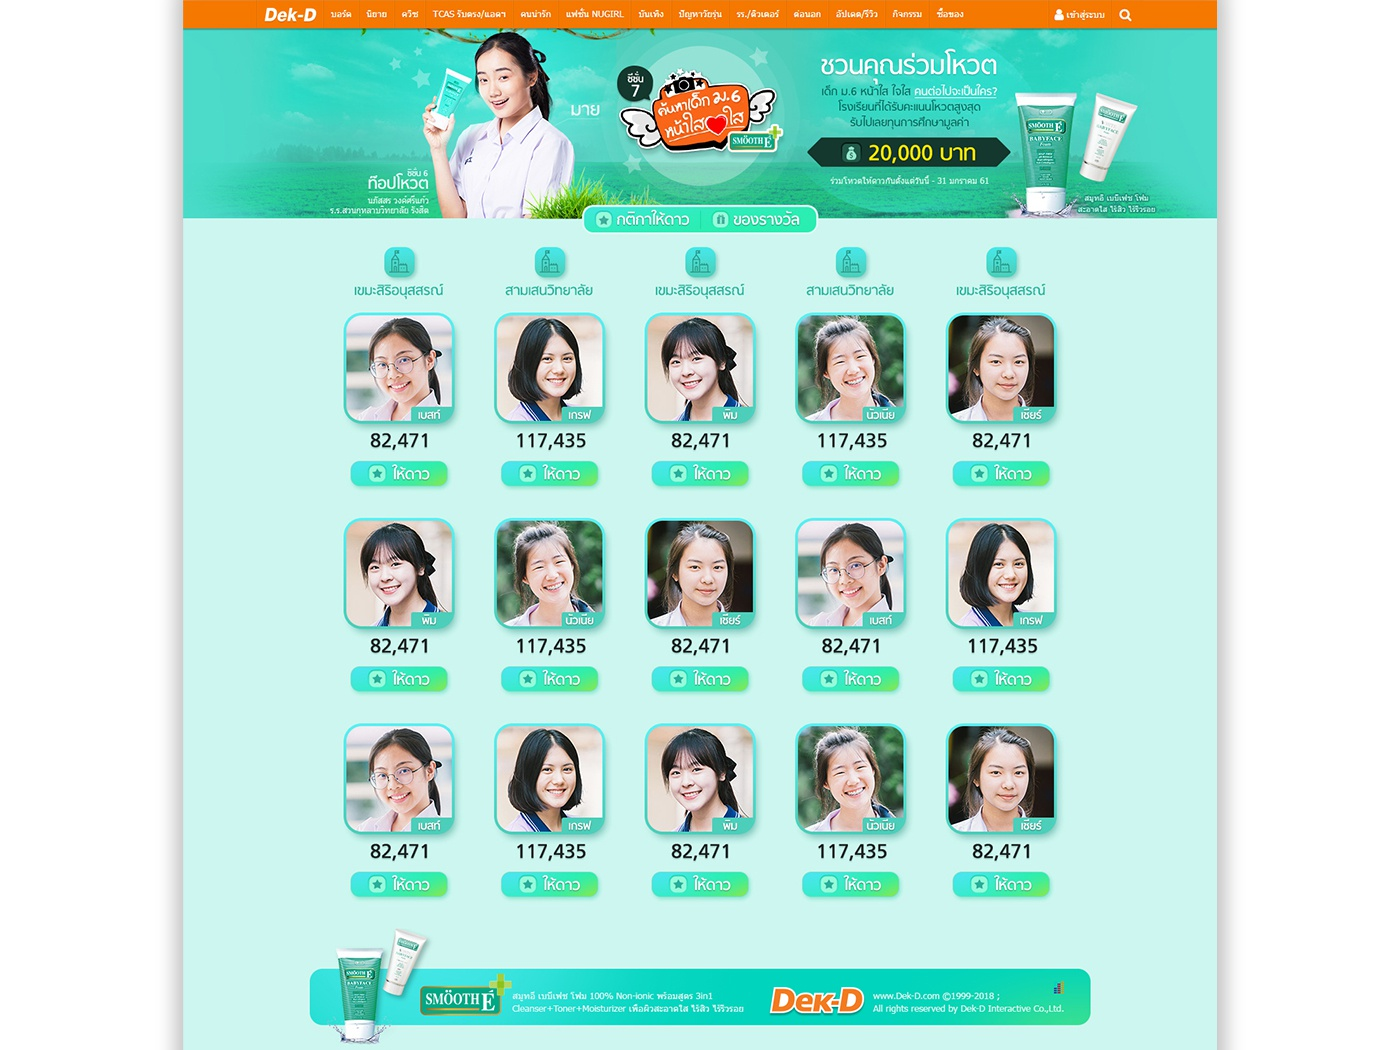 School Vote art direction creative direction graphic designer retouching ui ux web design mobile